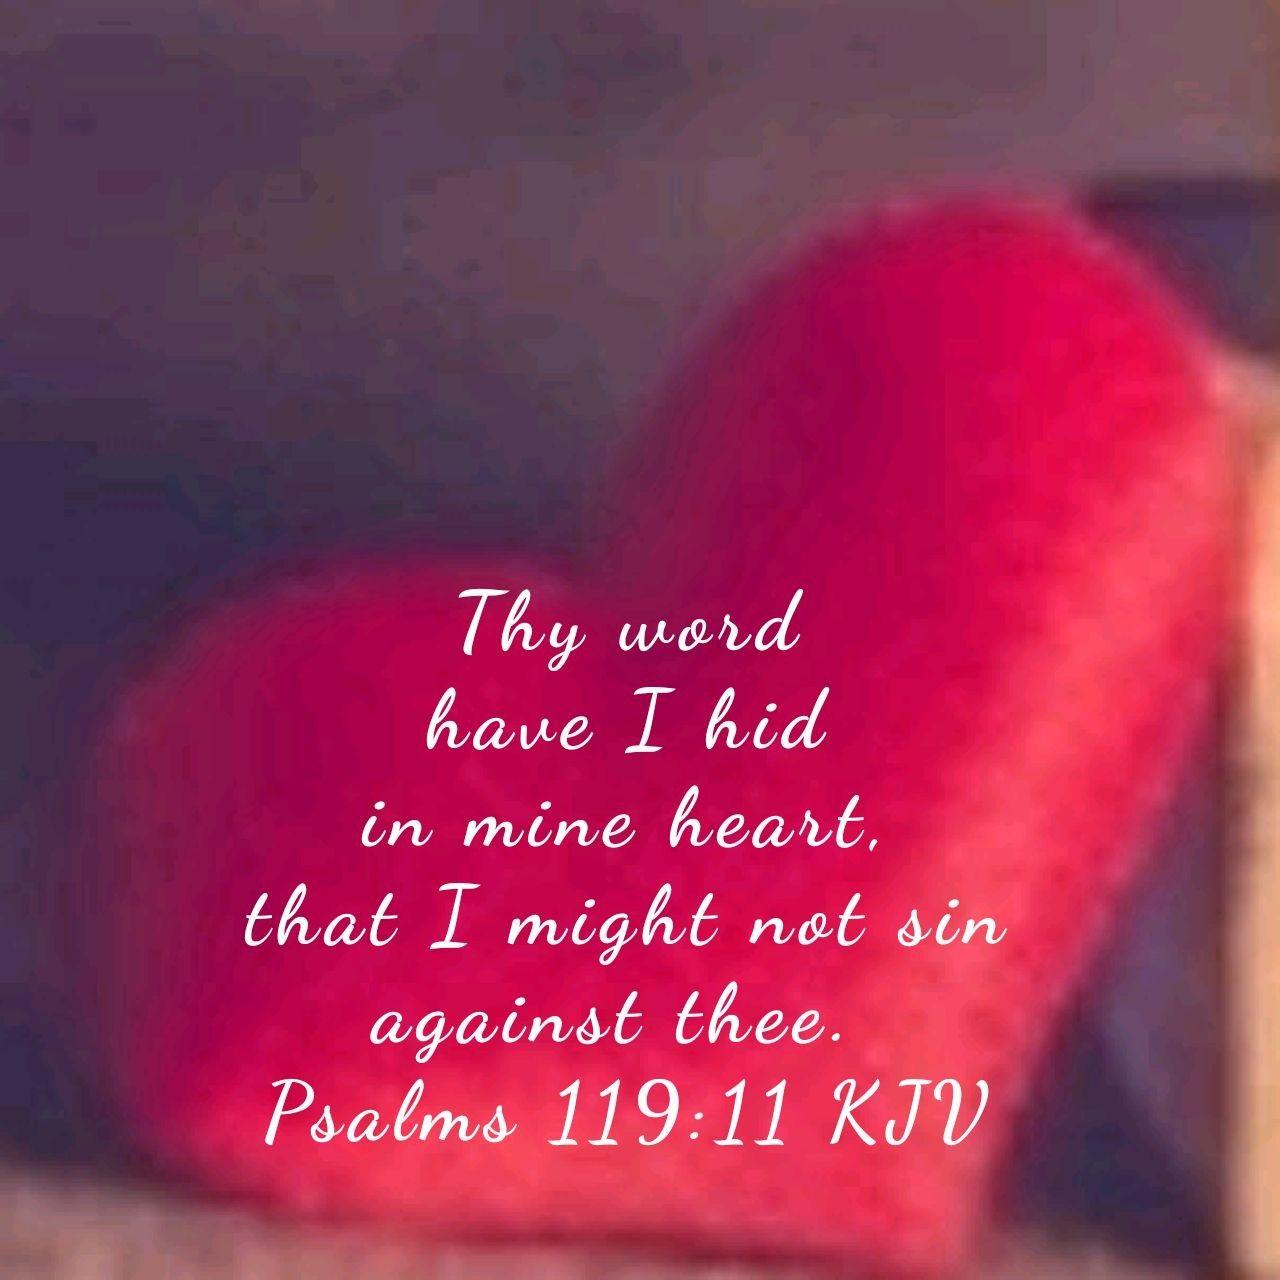 Psalms 119:11 KJV | Psalms 119, Psalms 119:11, Faith verses